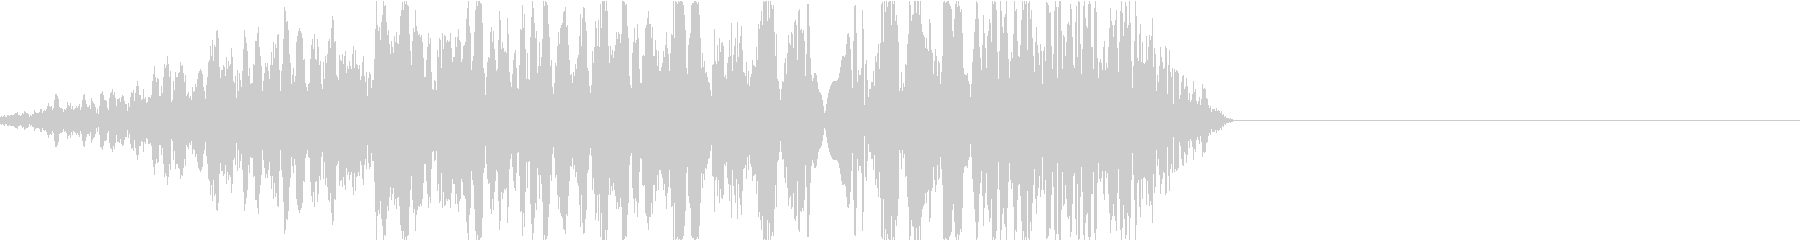 DJプレイ スクラッチ・ノイズ 191の未再生の波形